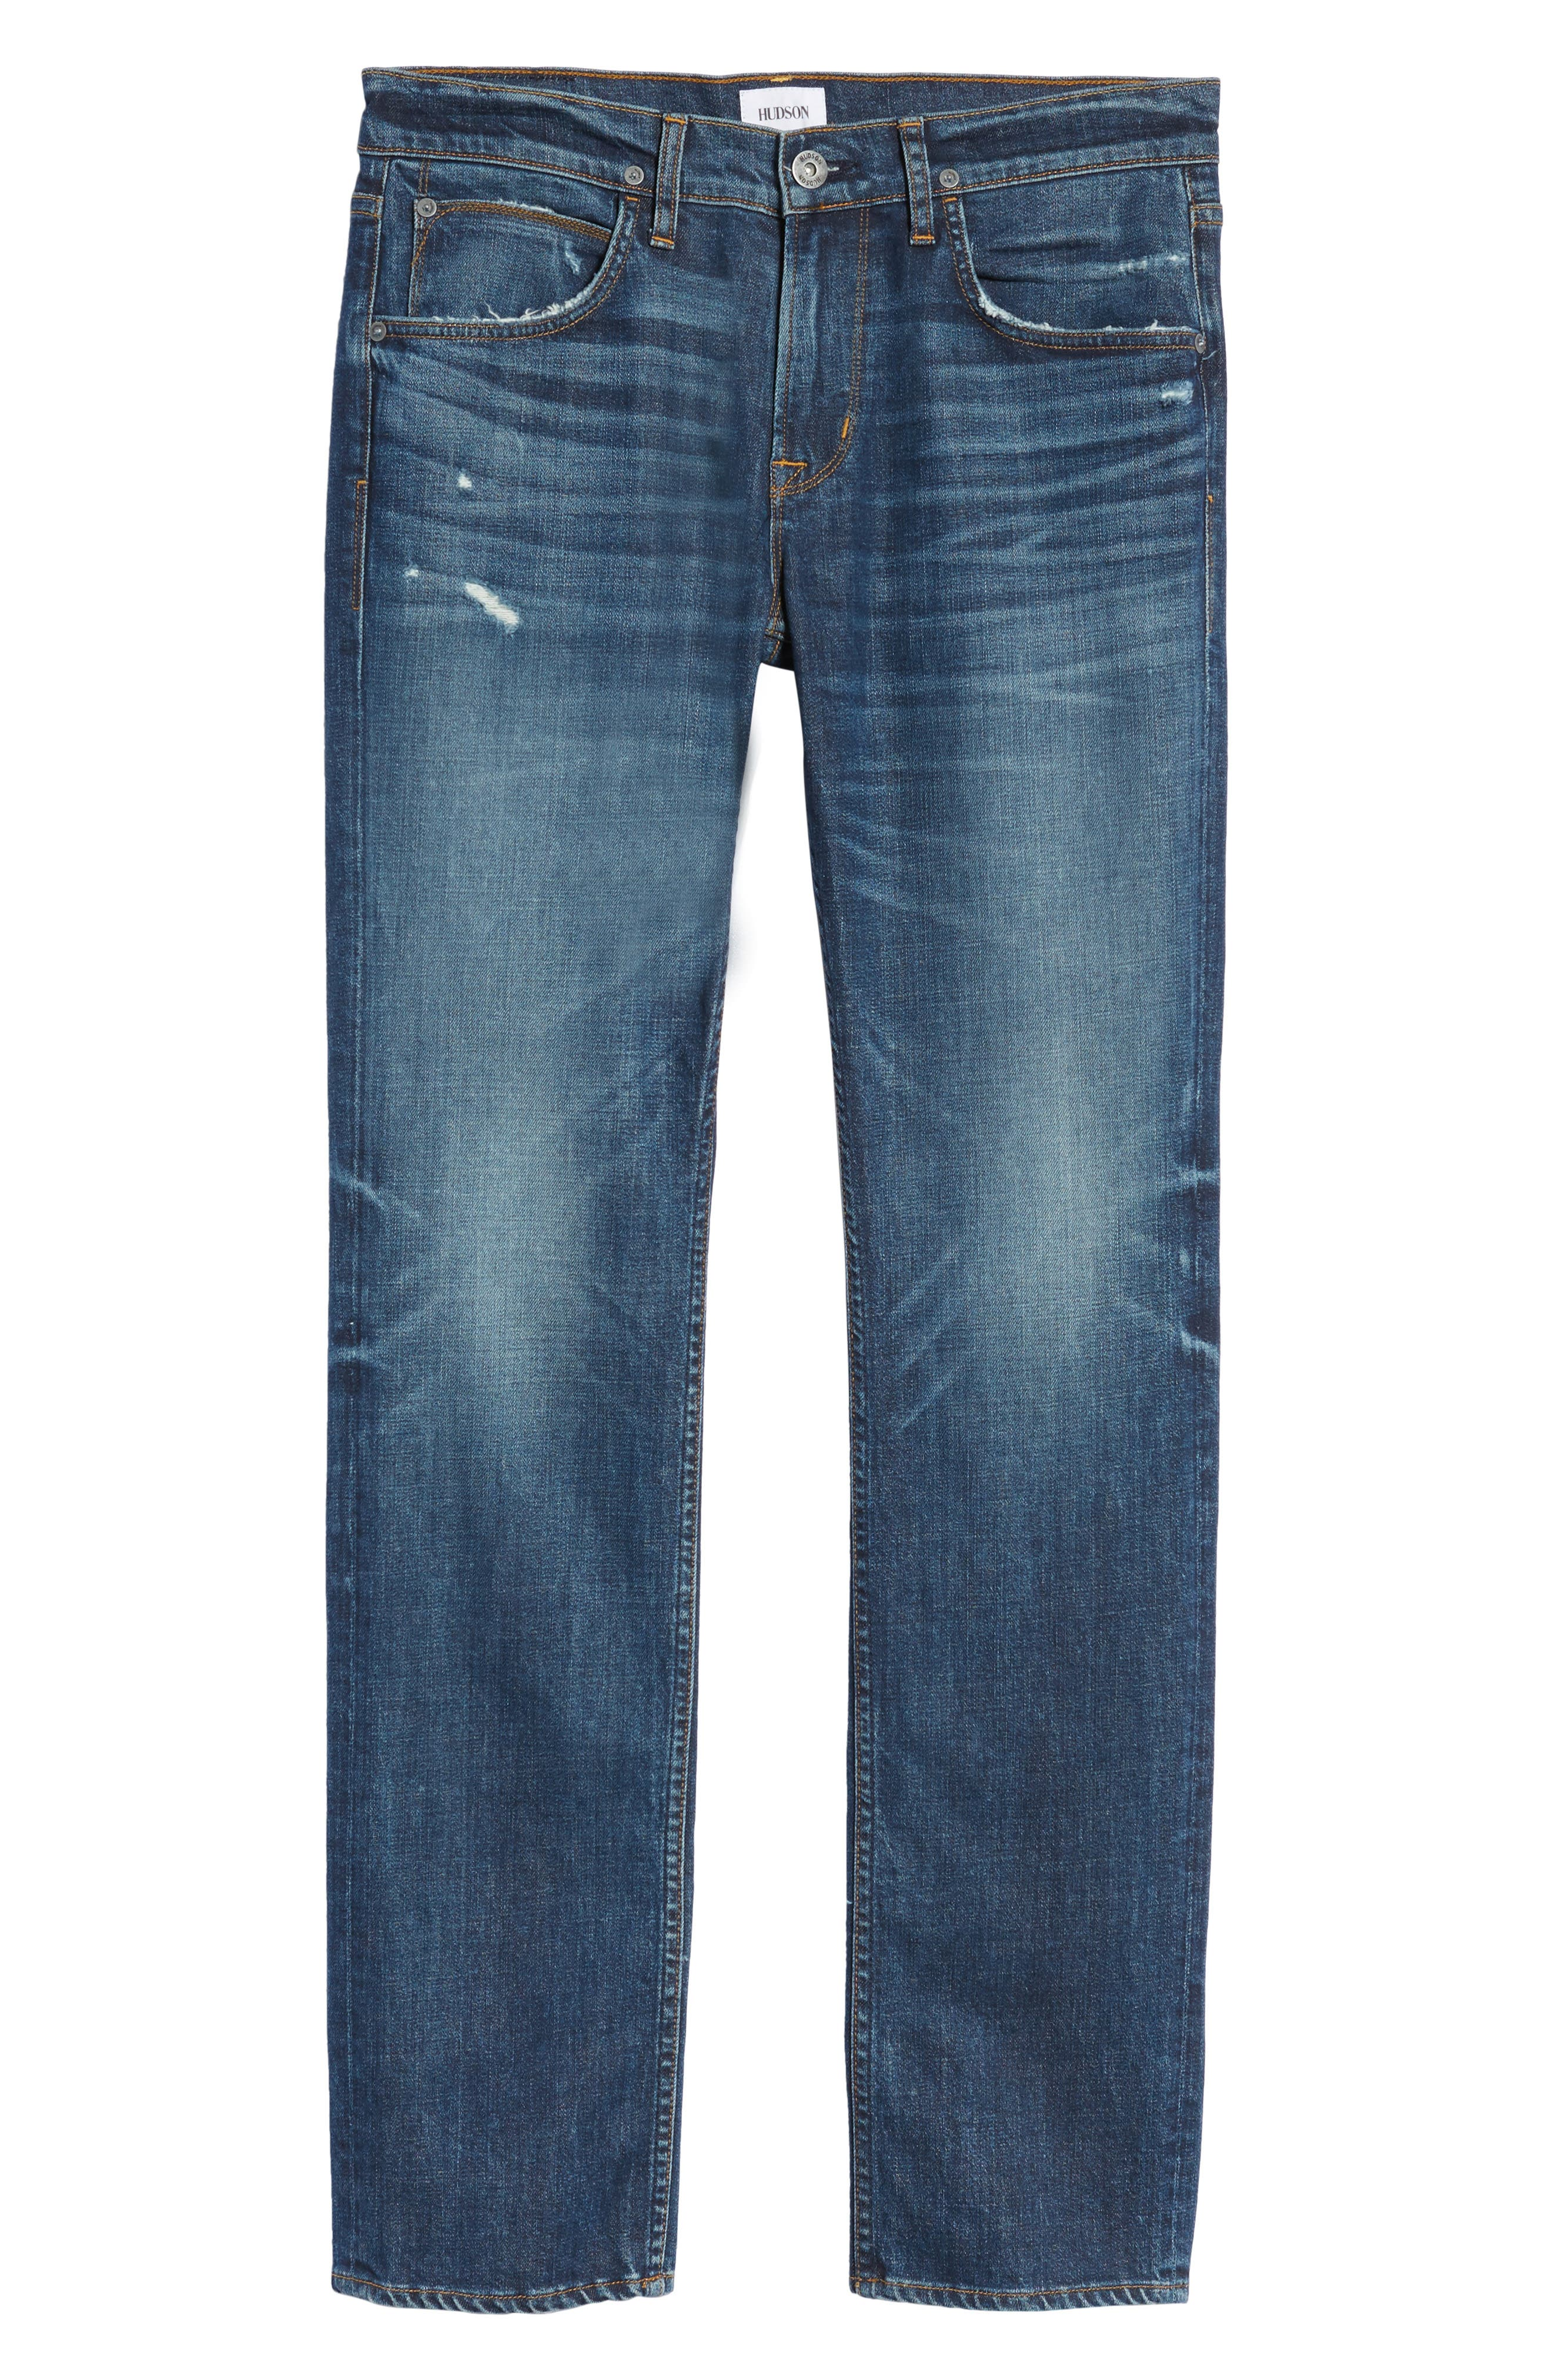 Byron Slim Straight Leg Jeans,                             Alternate thumbnail 6, color,                             Shuvit